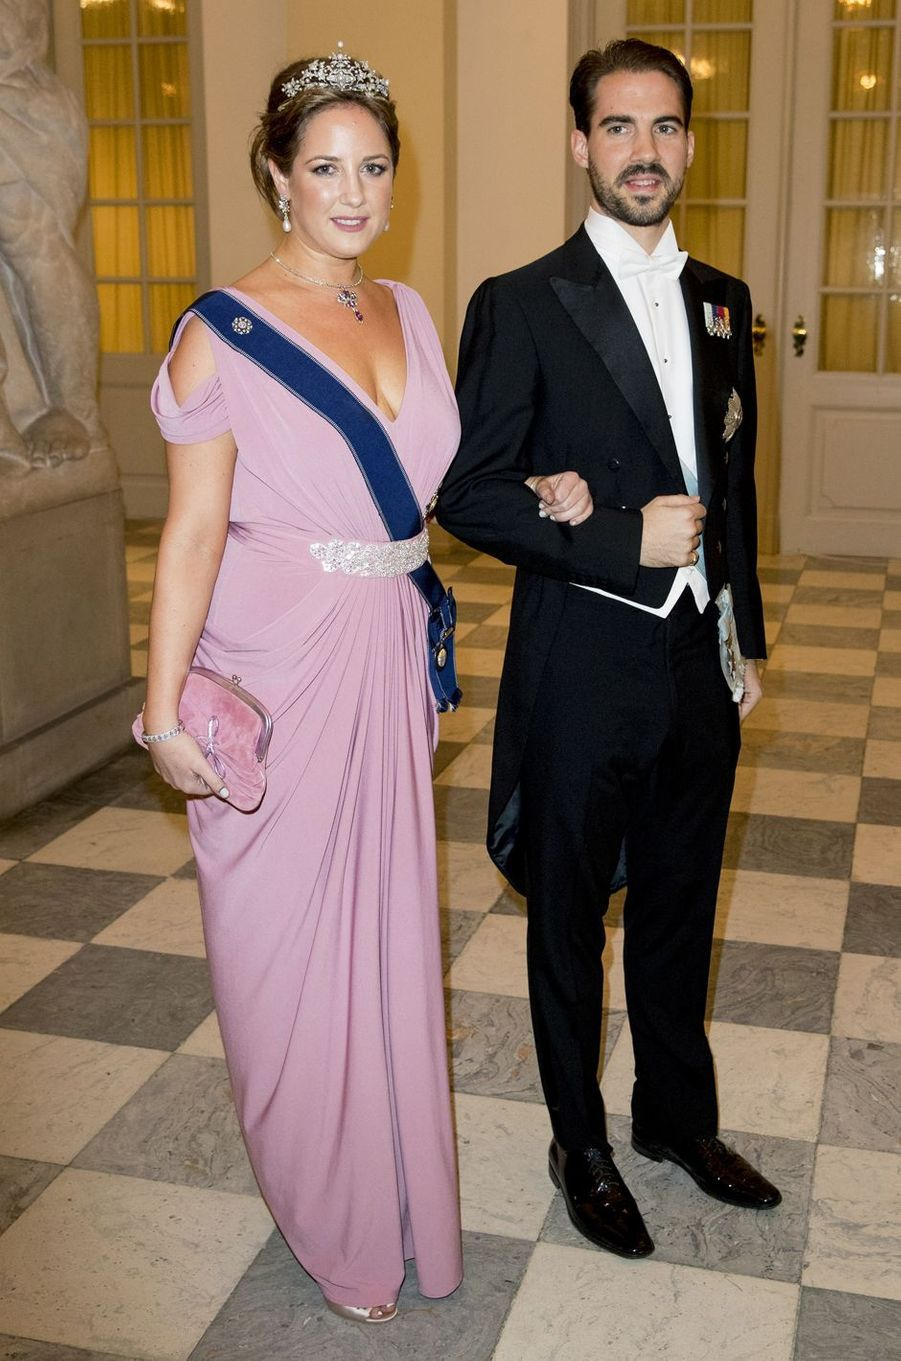 La princesse Tatiana et le prince Nikolaos de Grèce à Copenhague, le 26 mai 2018